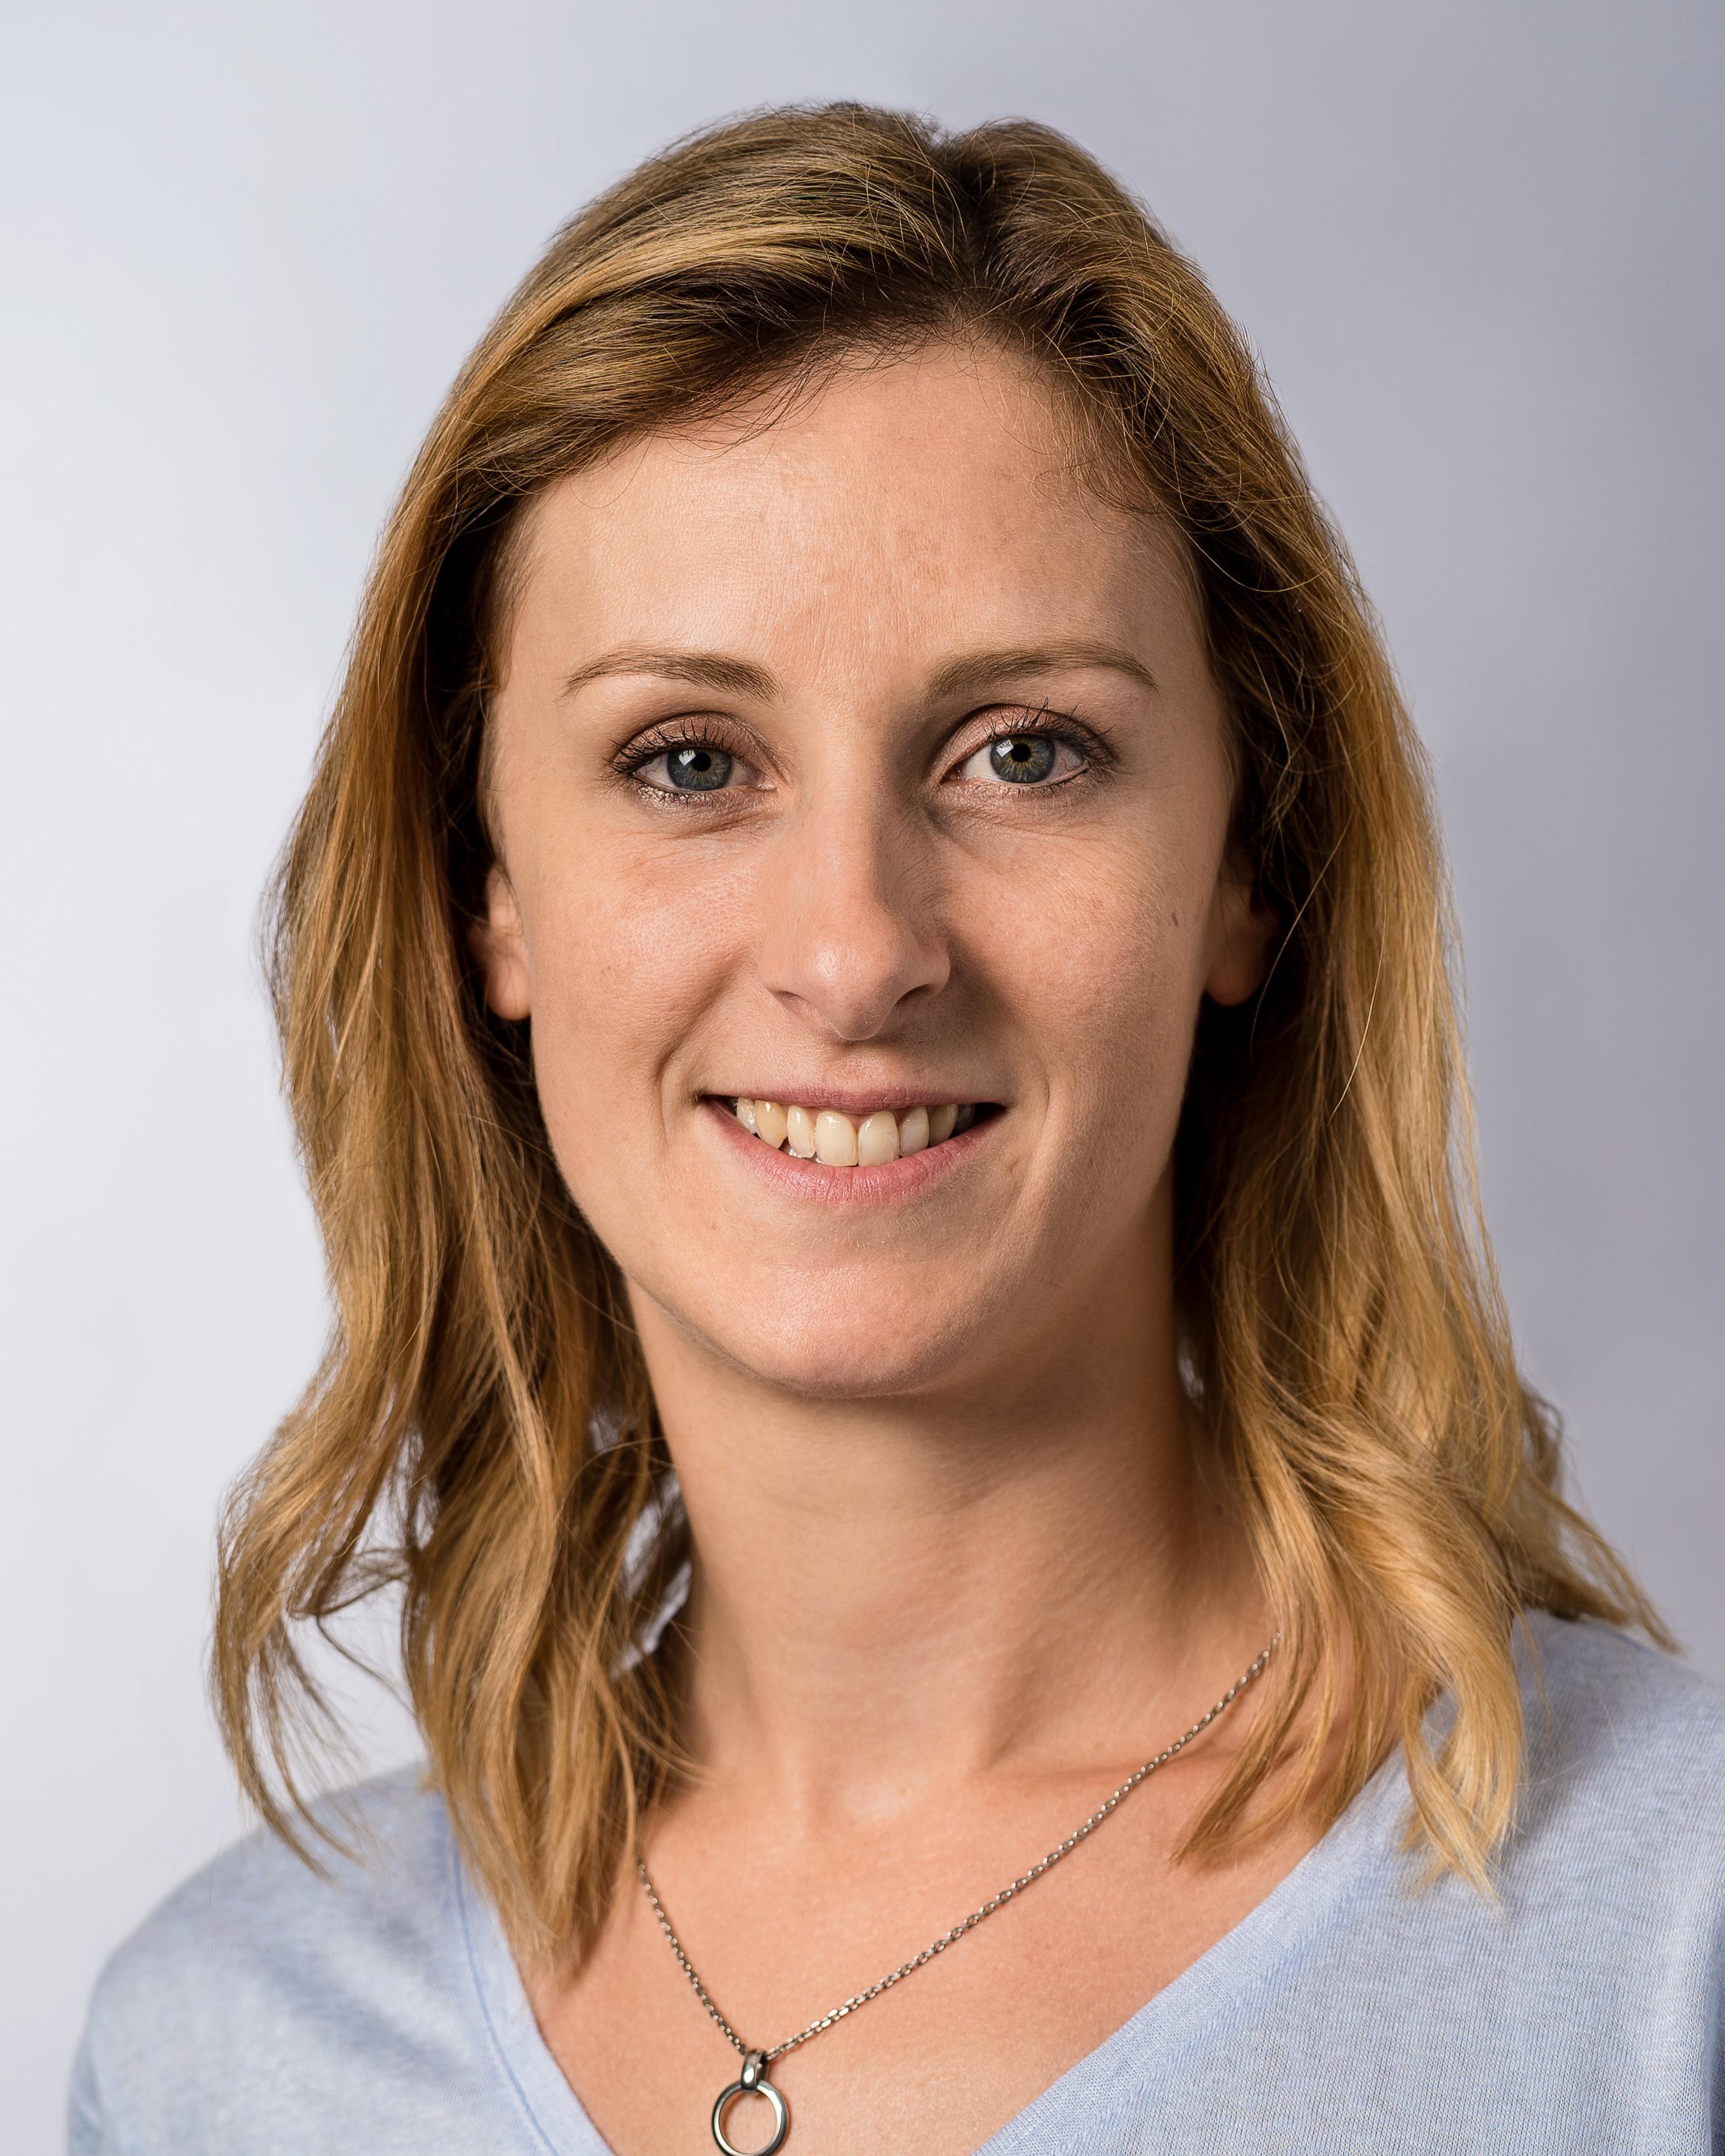 Miriam Wälchli